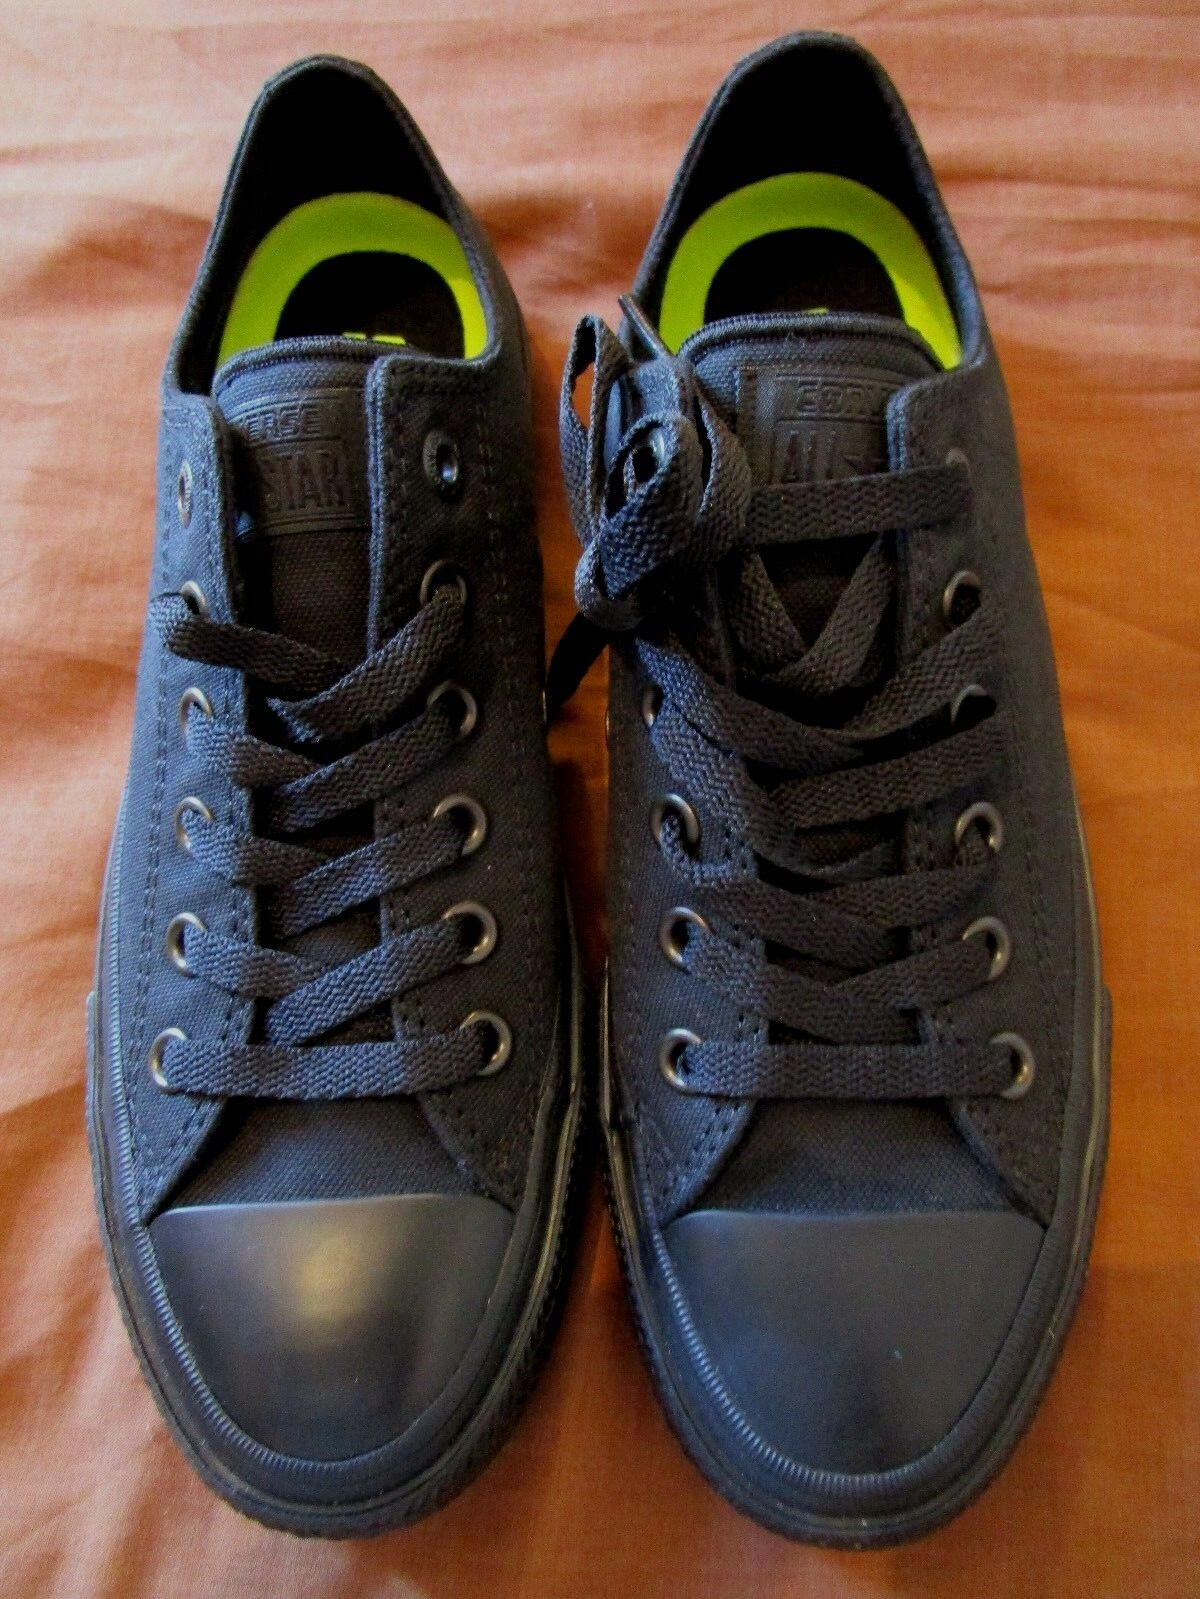 NEW GENUINE MENS CONVERSE BLACK BLACK OX LOWS CHUCK II SIZE 6 EU 39  24.5cm CAN